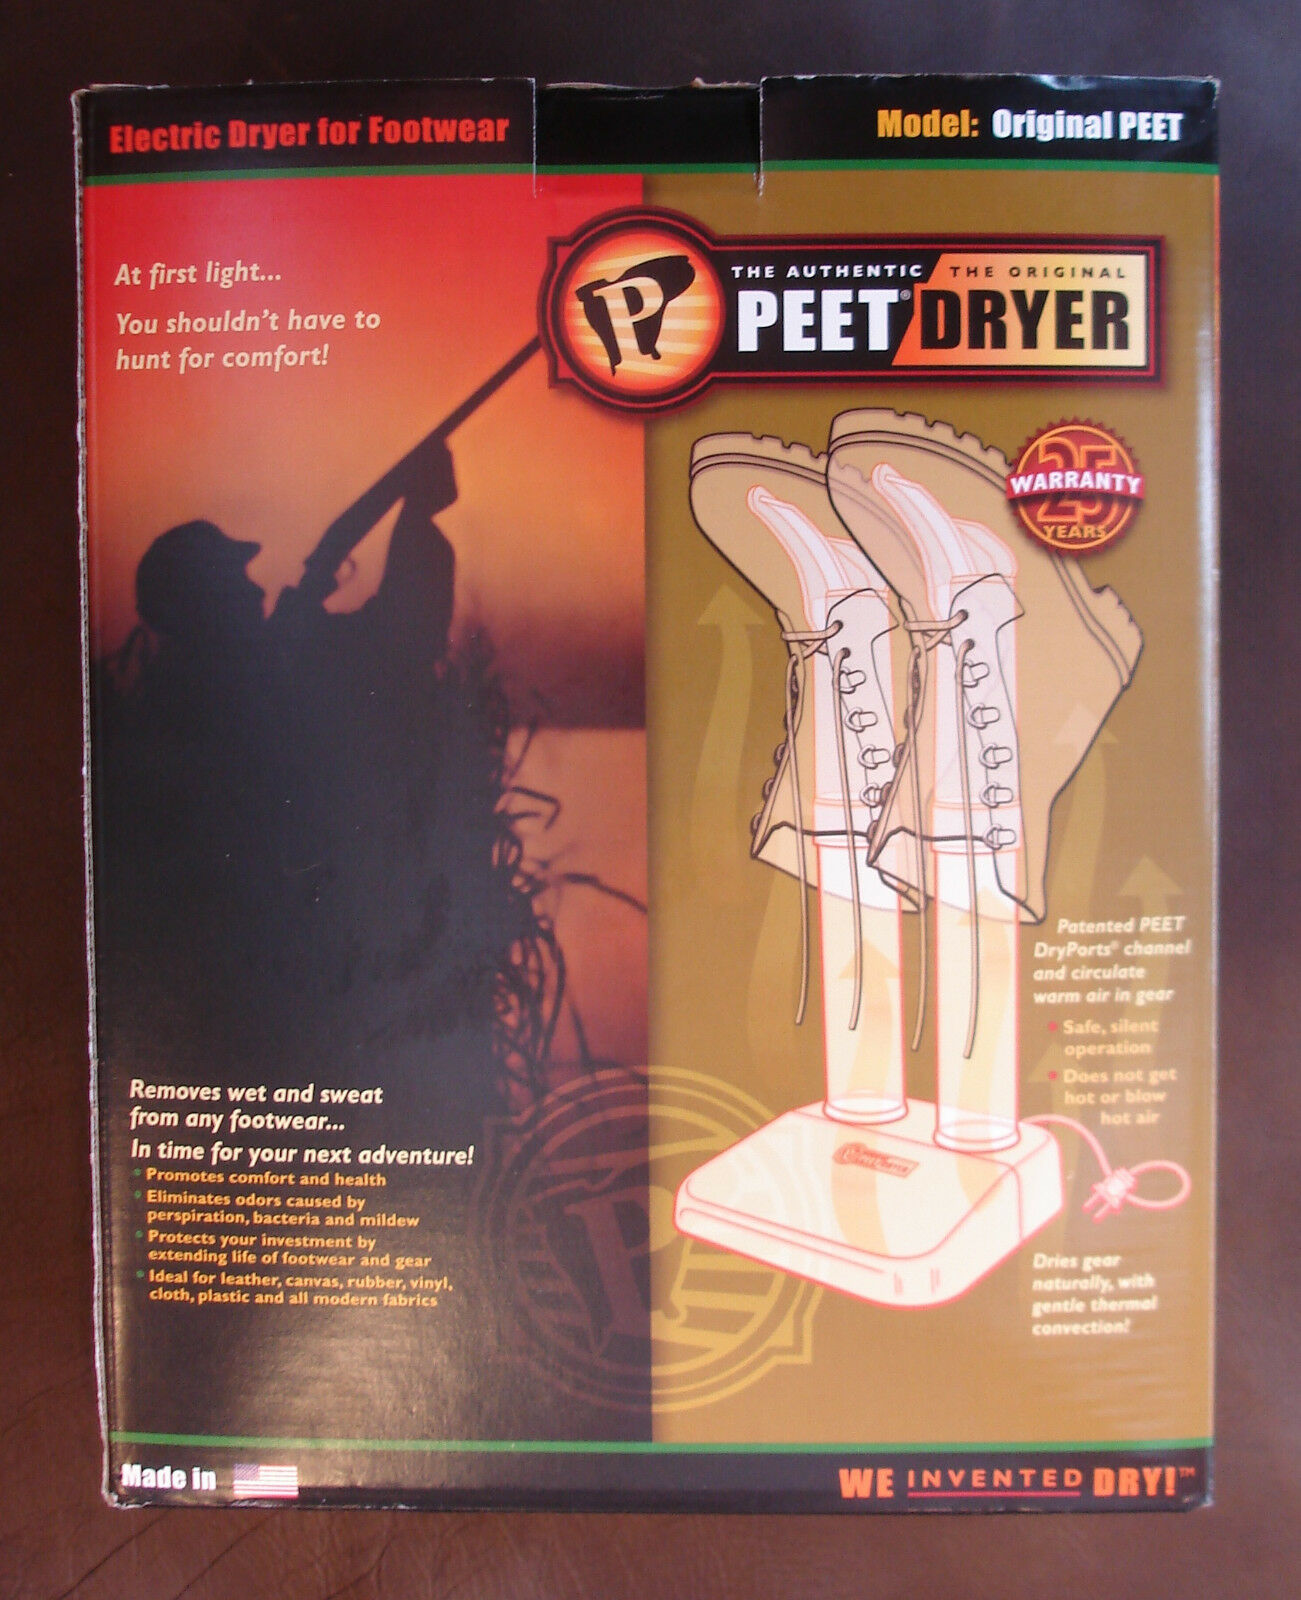 Peet Original Peet Boot Dryer Electric Thermal